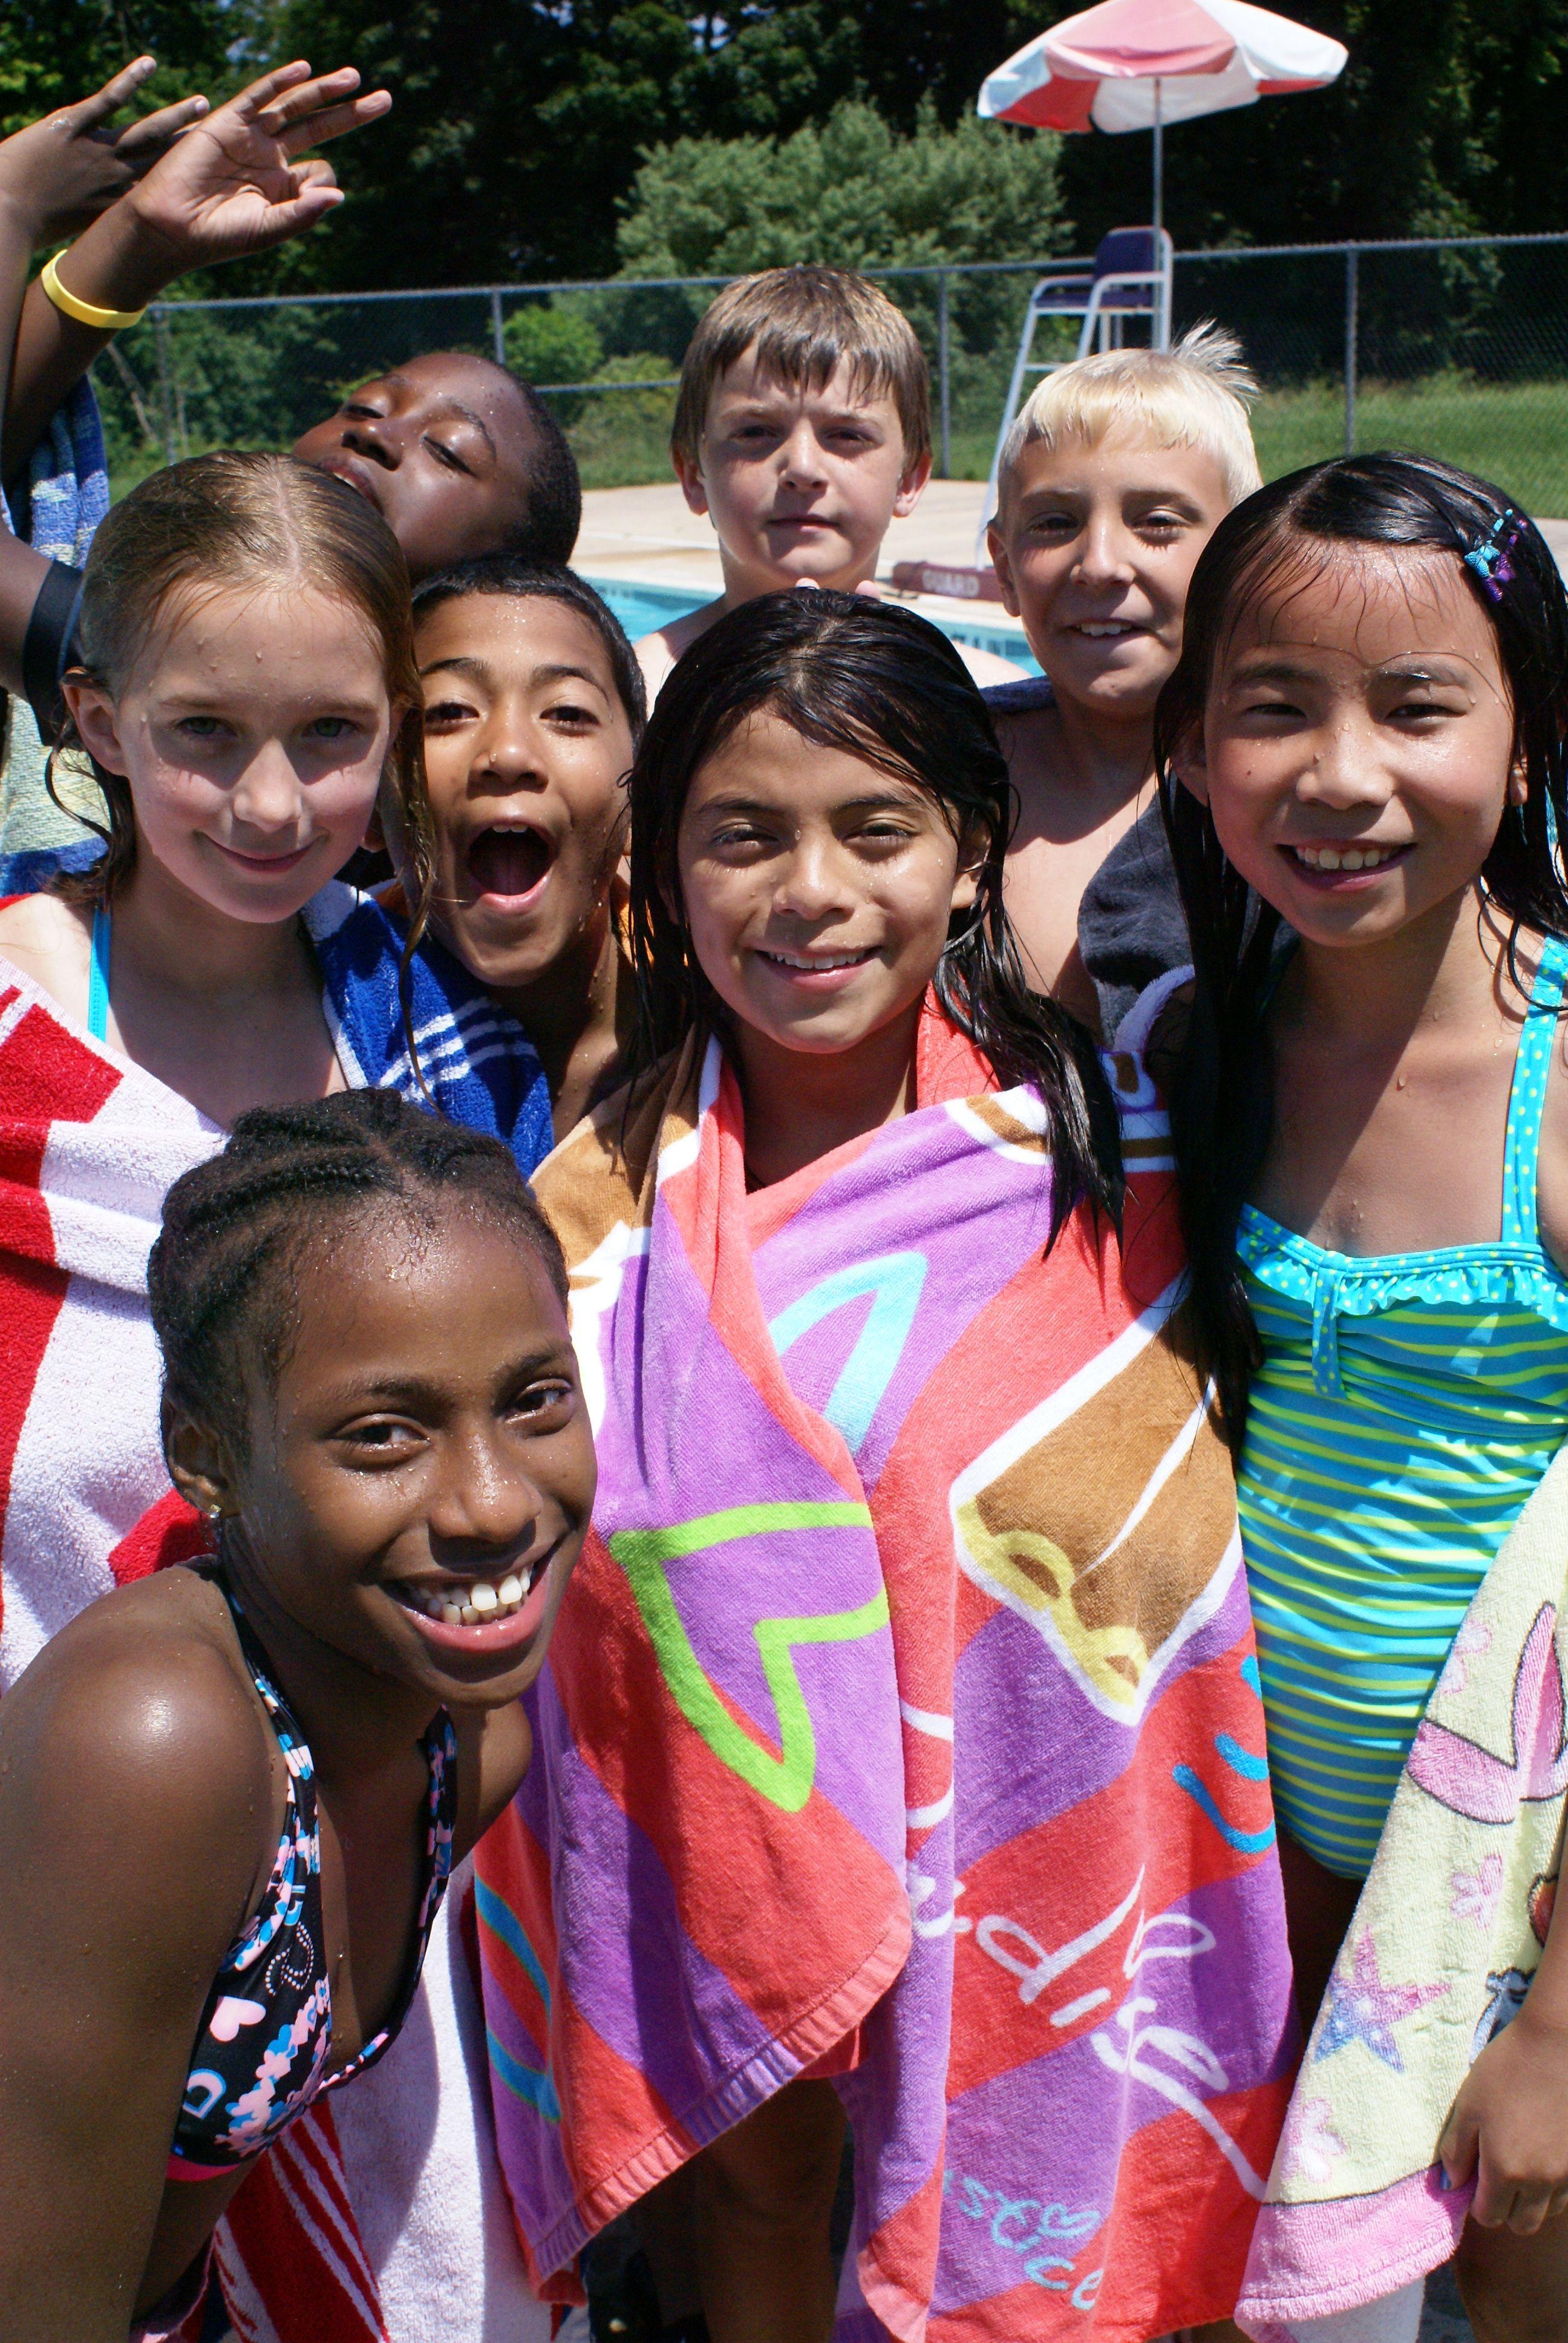 Camp garrett campers at the pool wwwgarrettwilliamson